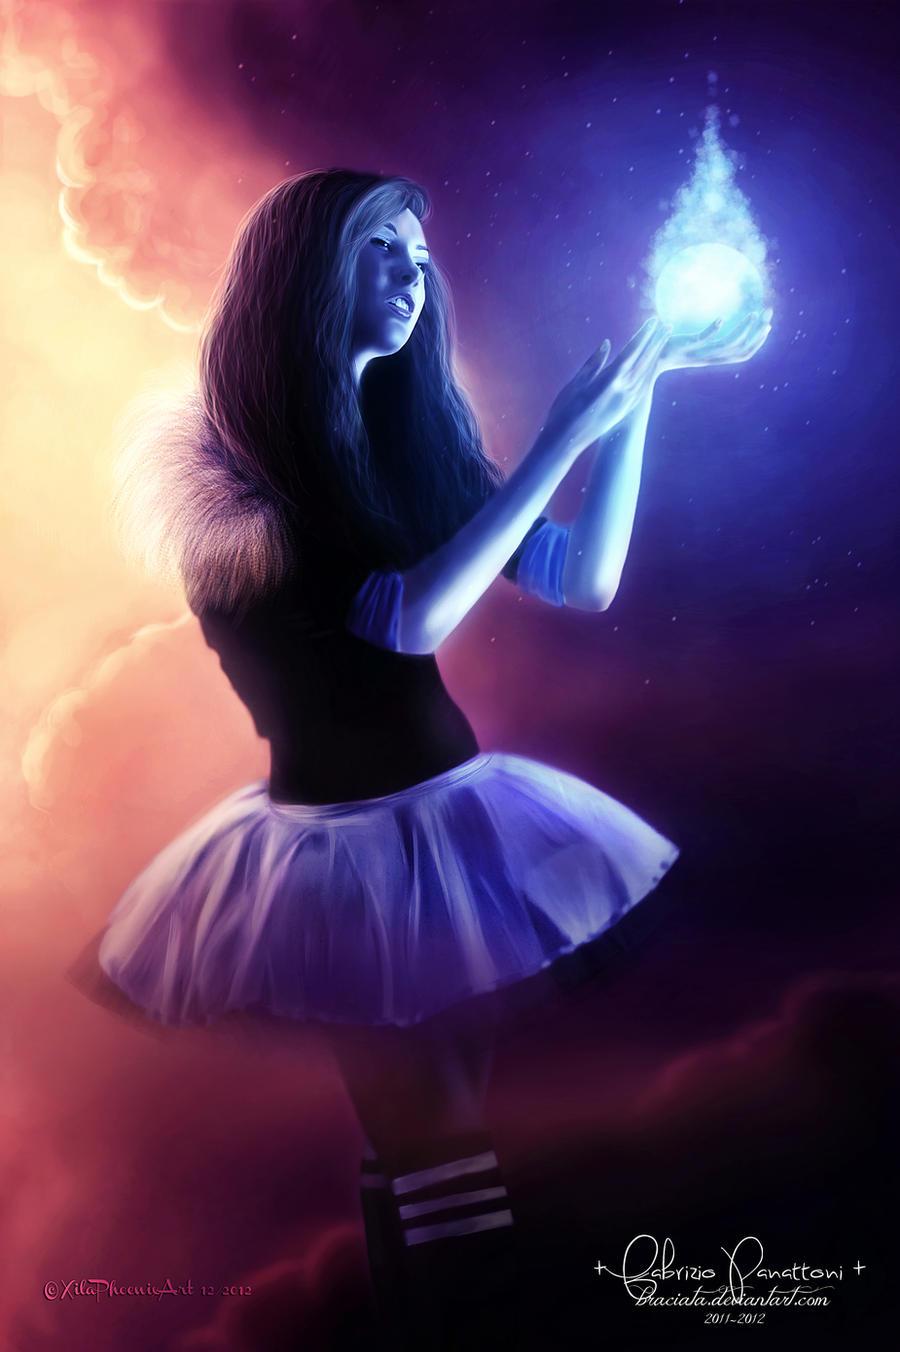 A kind of magic by FP-Digital-Art